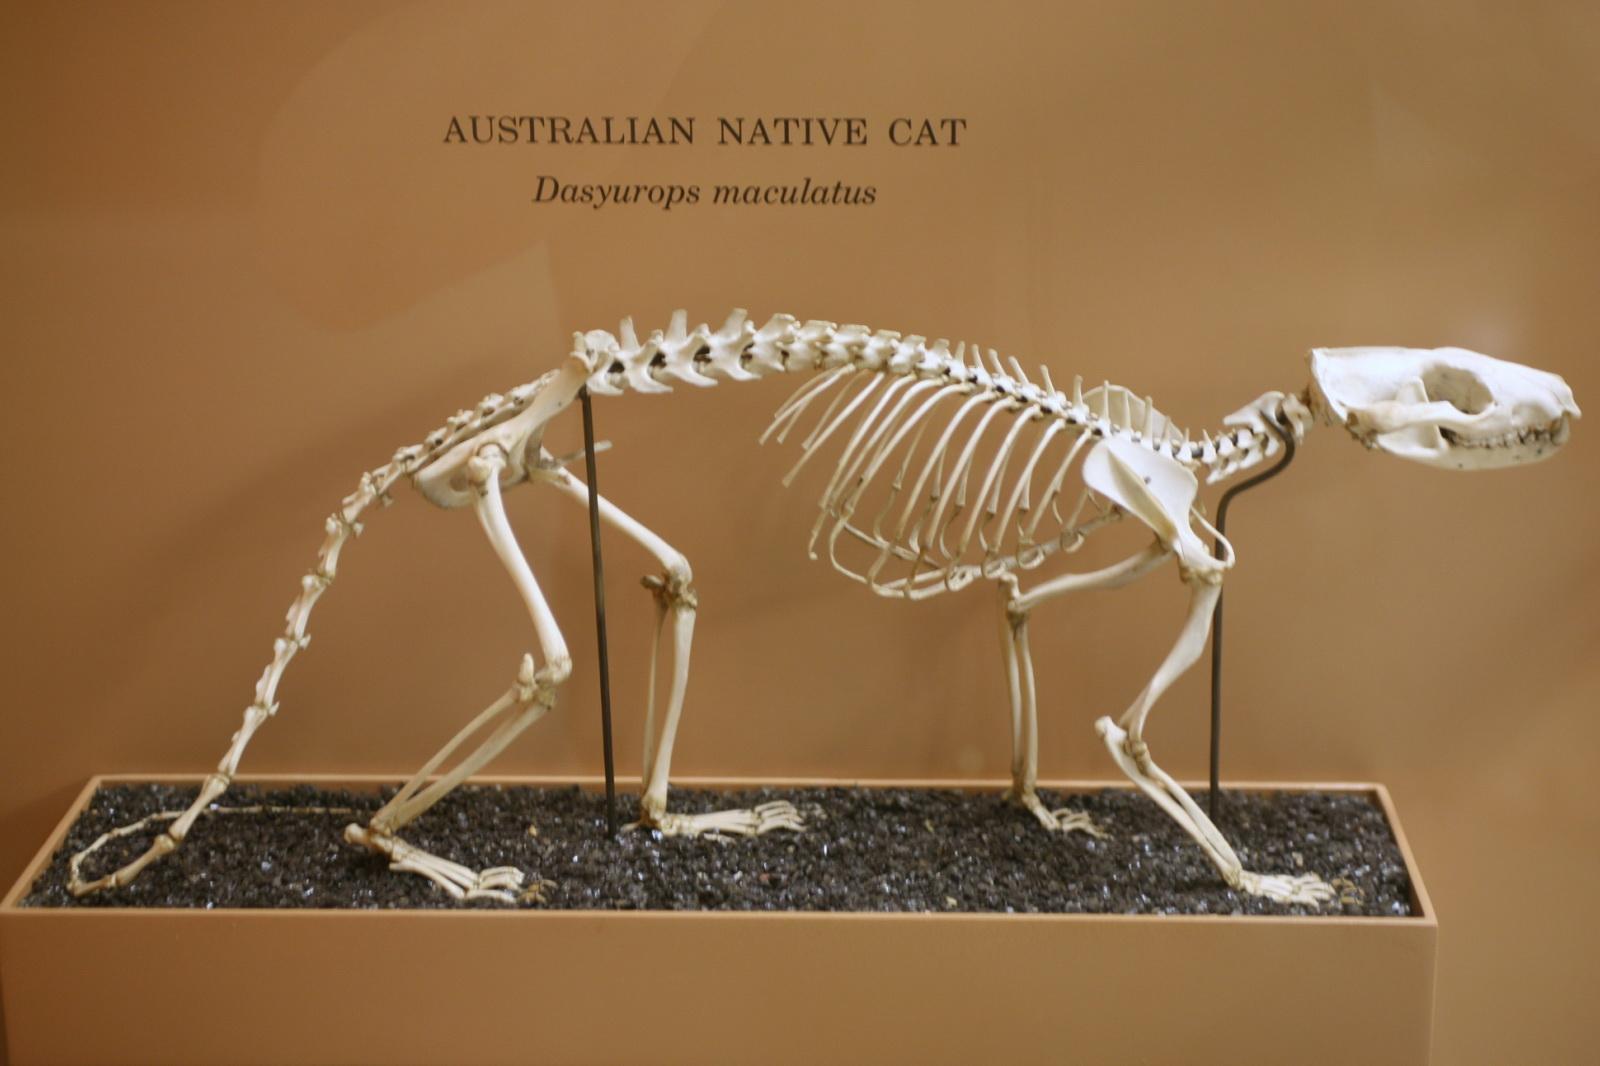 https://upload.wikimedia.org/wikipedia/commons/e/e6/Dasyurus_maculatus_skeleton.jpg